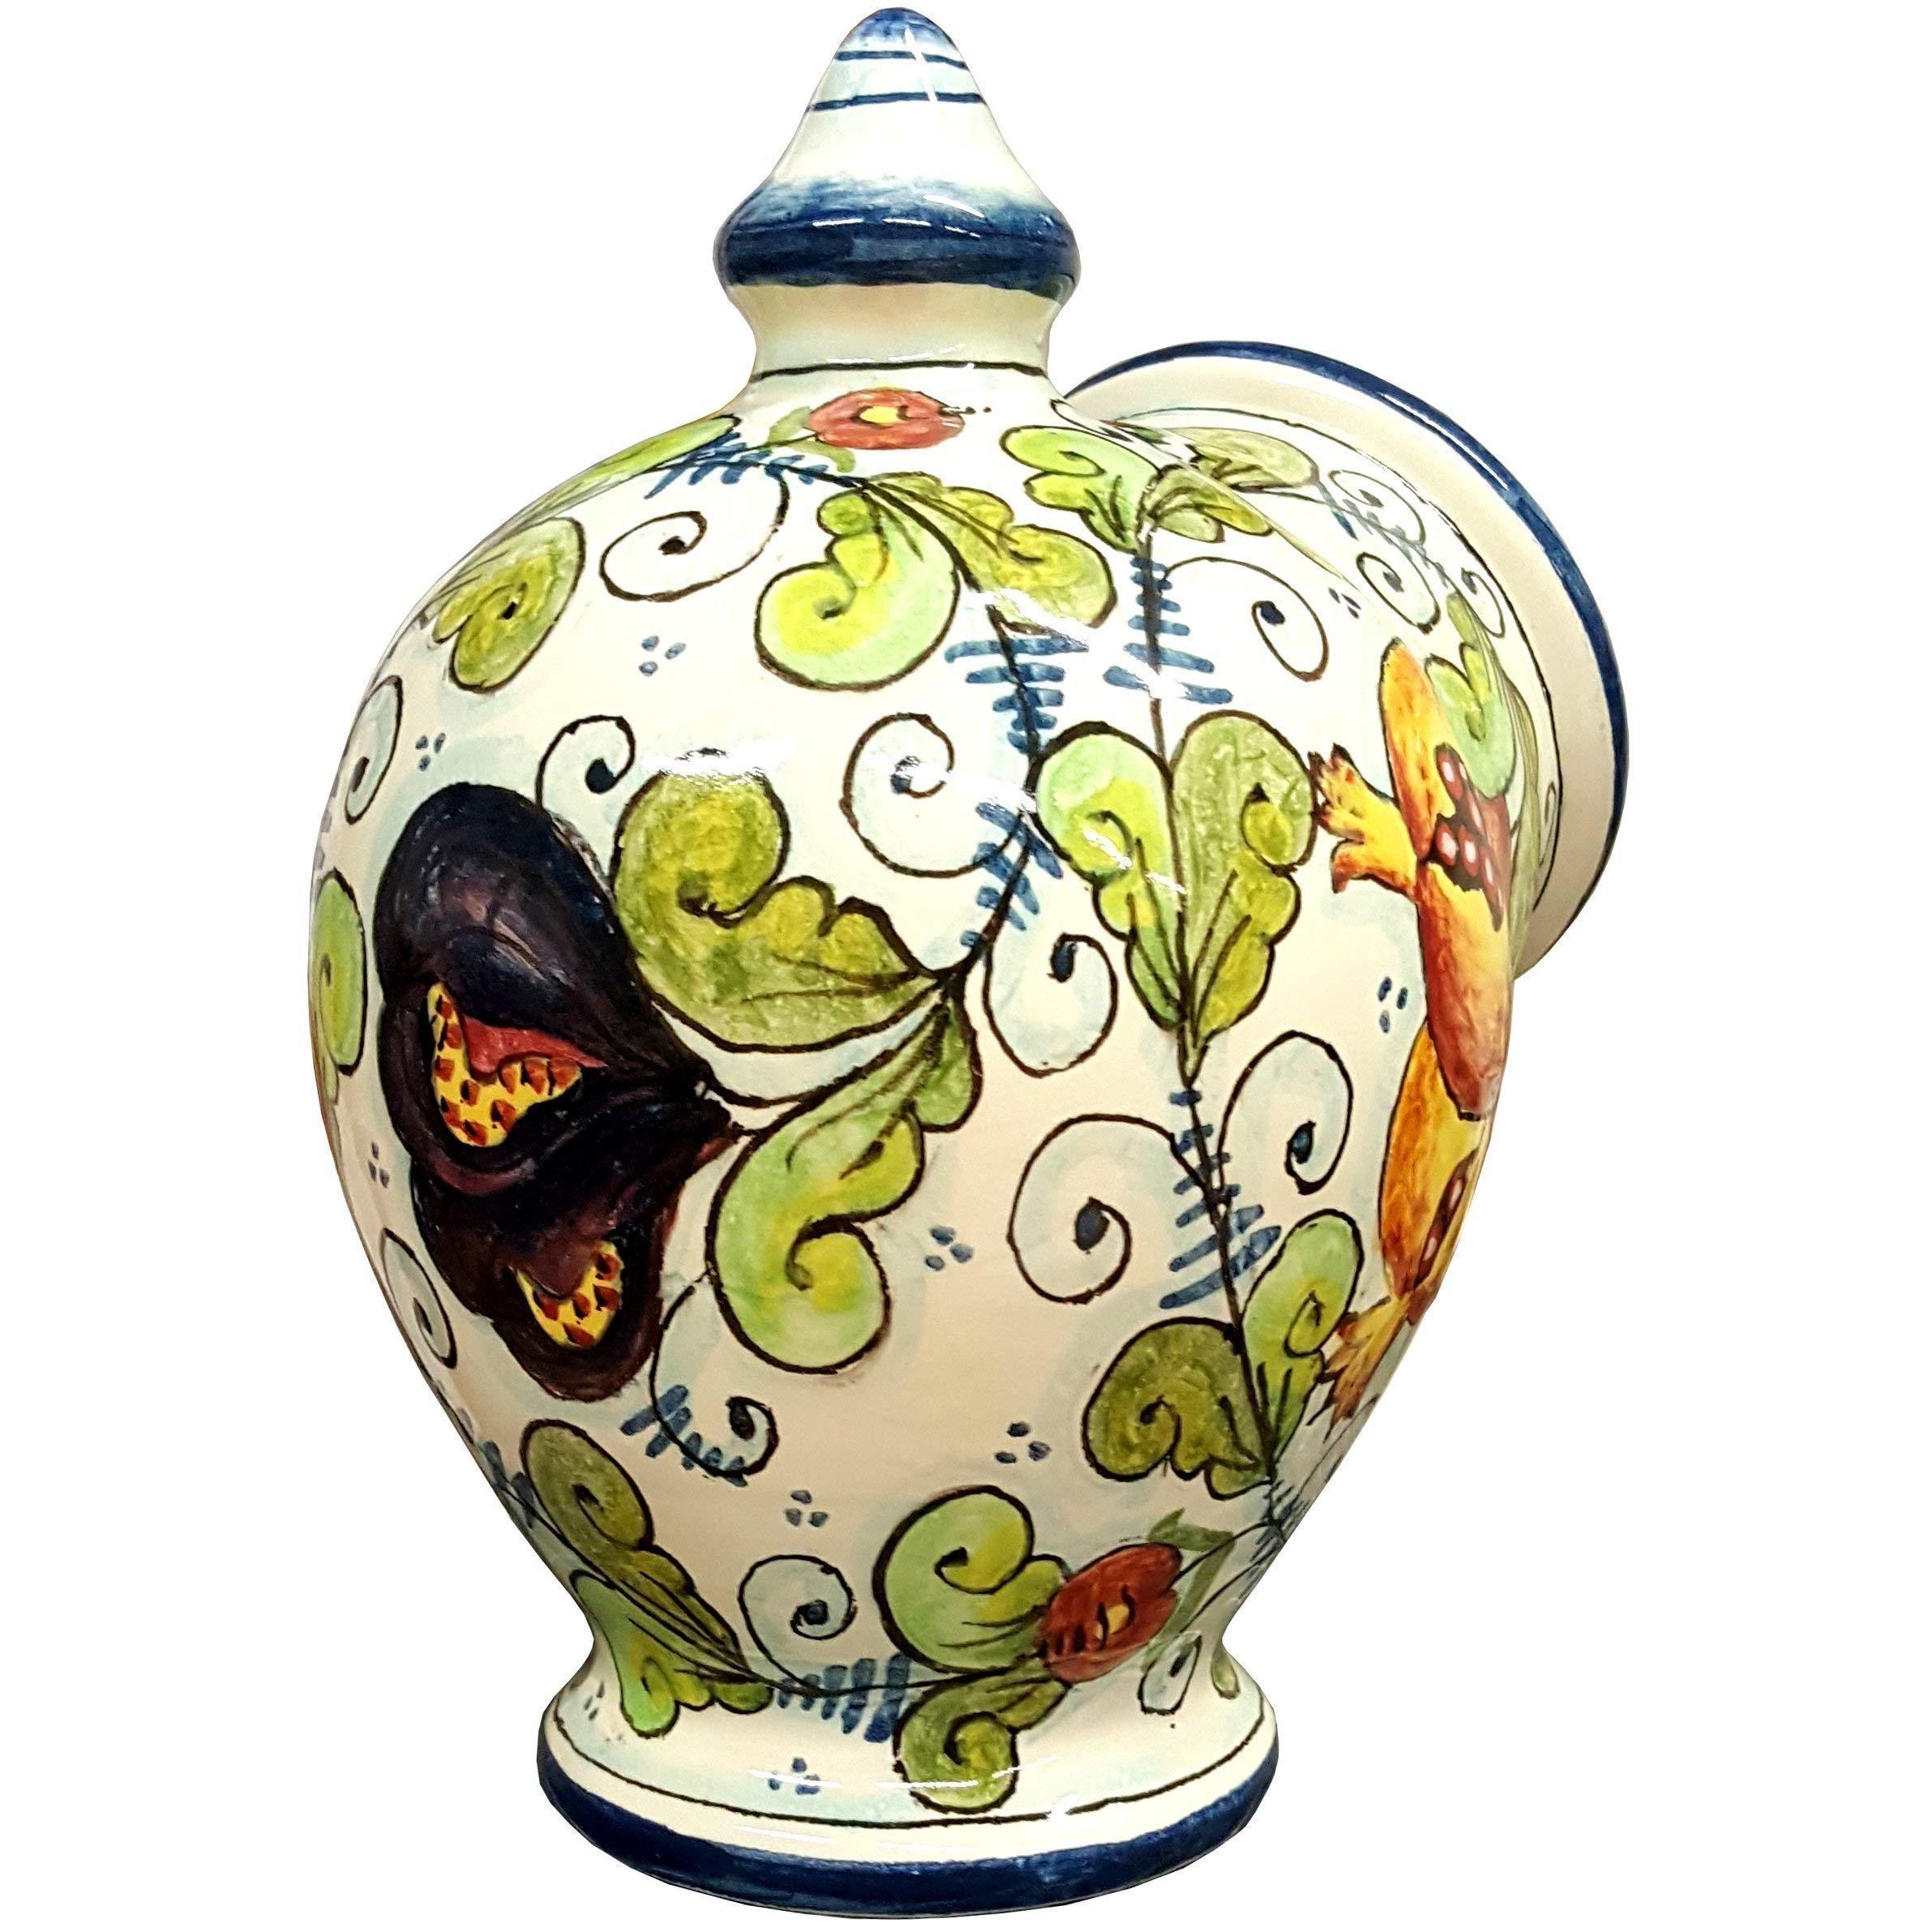 CERAMICHE D'ARTE PARRINI- Italian Ceramic Jar Salt Holder Sponge Hand Painted Decorated Fruit Made in ITALY Tuscan Art Pottery by CERAMICHE D'ARTE PARRINI since 1979 (Image #3)